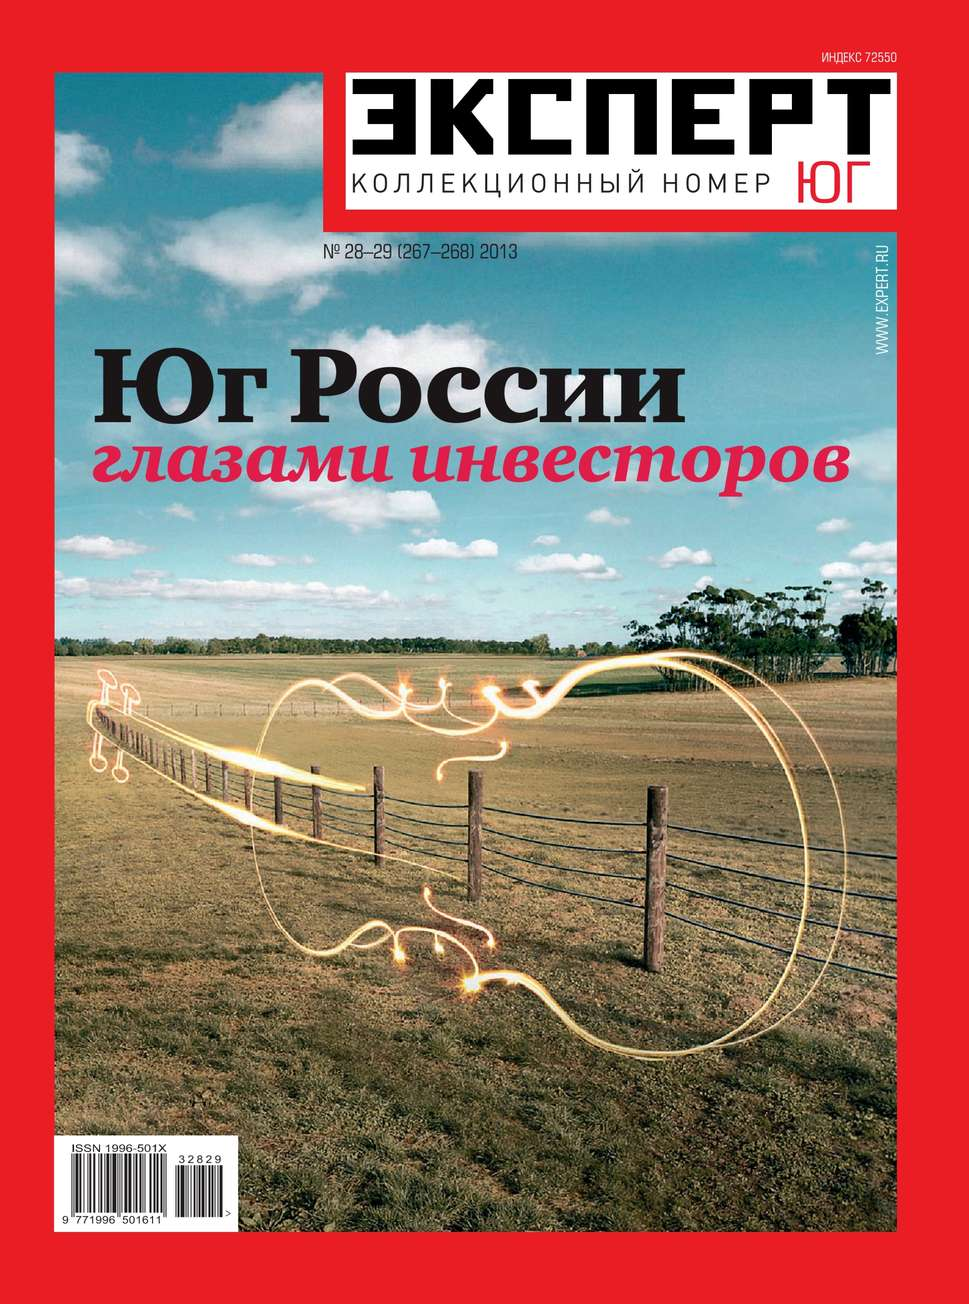 Редакция журнала Эксперт Юг Эксперт Юг 28-29/2013 цена